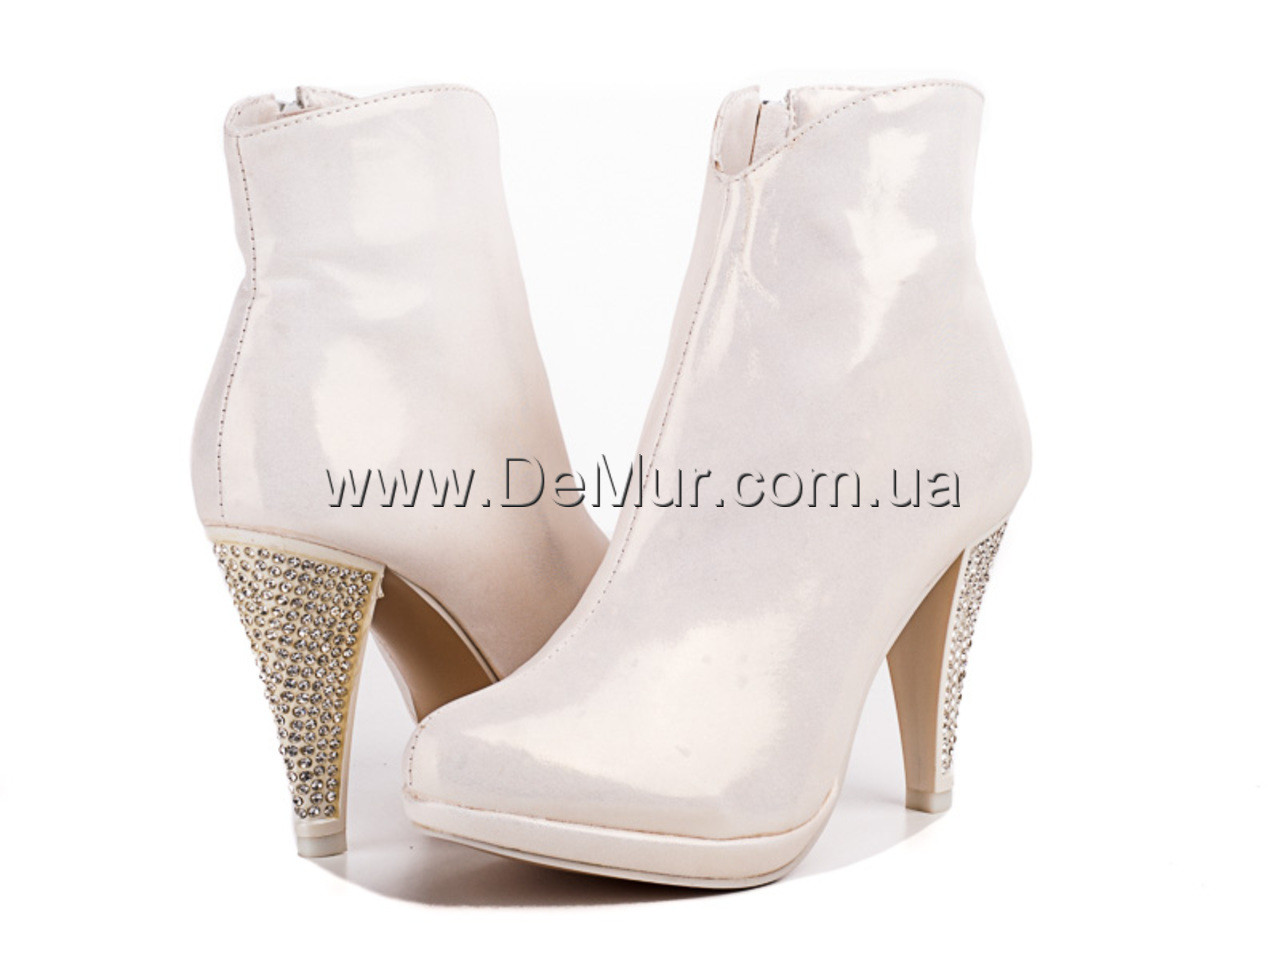 Сапоги женские (35-40) Louisa 652-B1391B cream - DeMur интернет-магазин обуви в Одессе